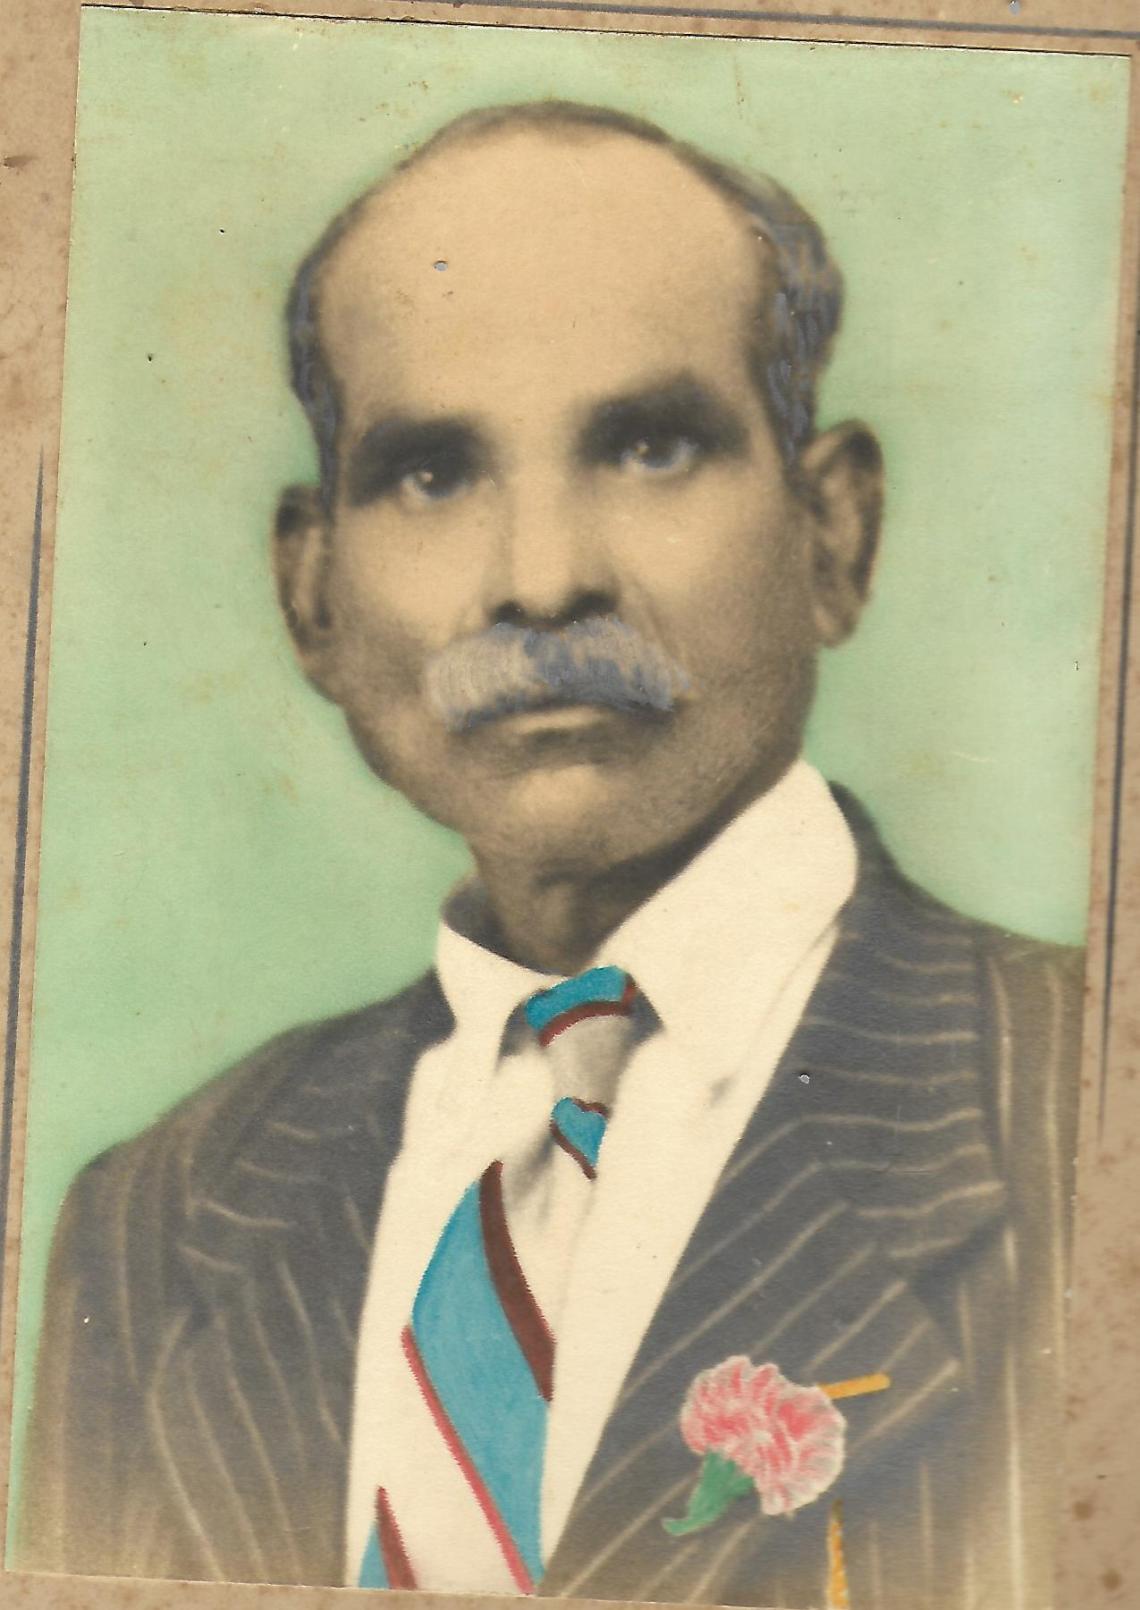 Muniamma - Mr Coopoosamy Govender husband of Muniamma - daughter of Kandasamy and Thanji Naiken